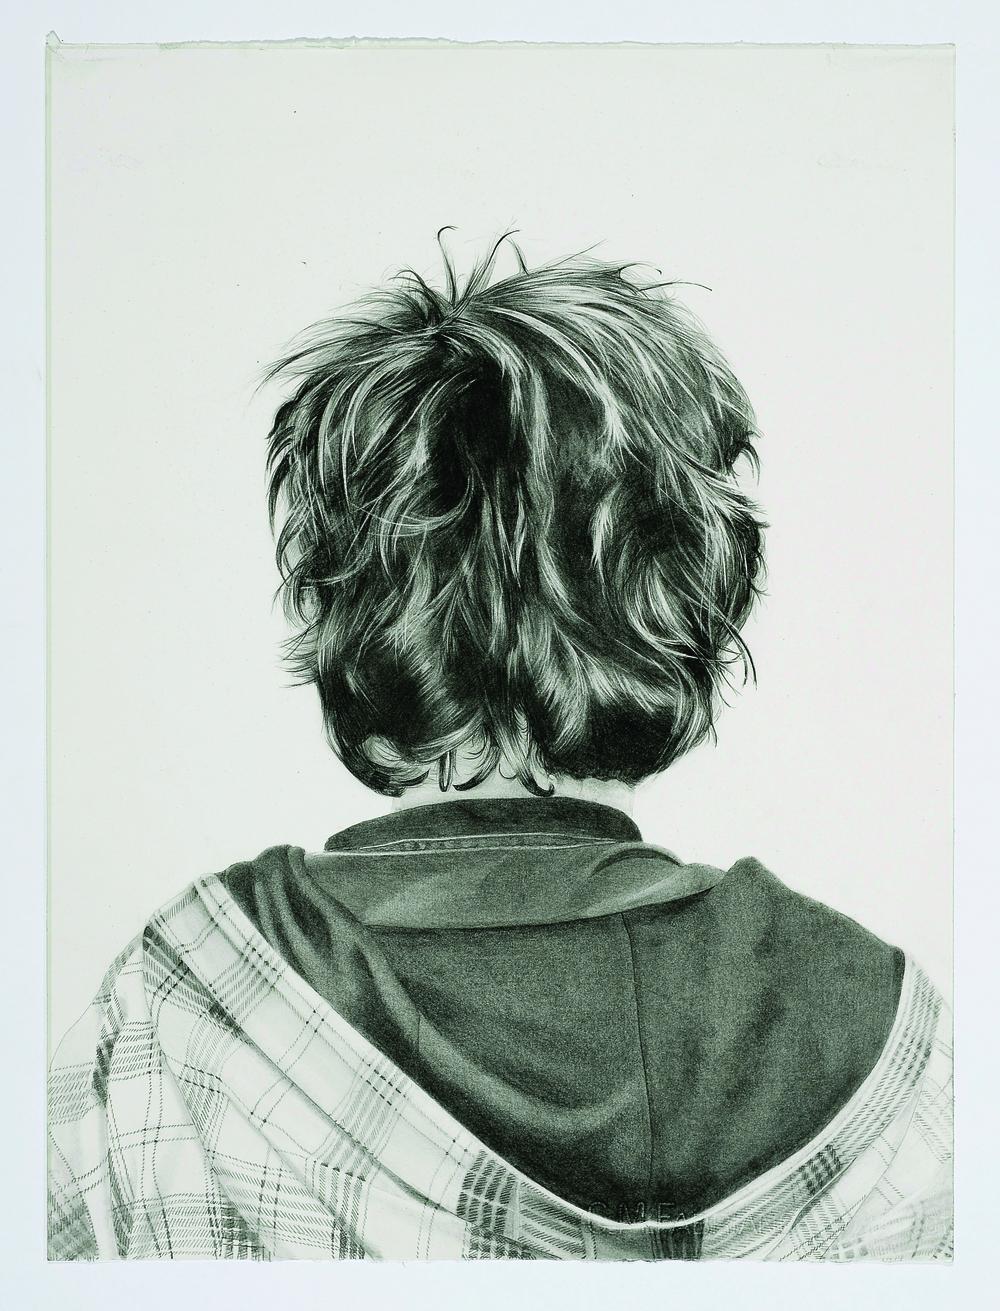 Pierre 2009 graphite on paper 76.0 x 52.0 cm